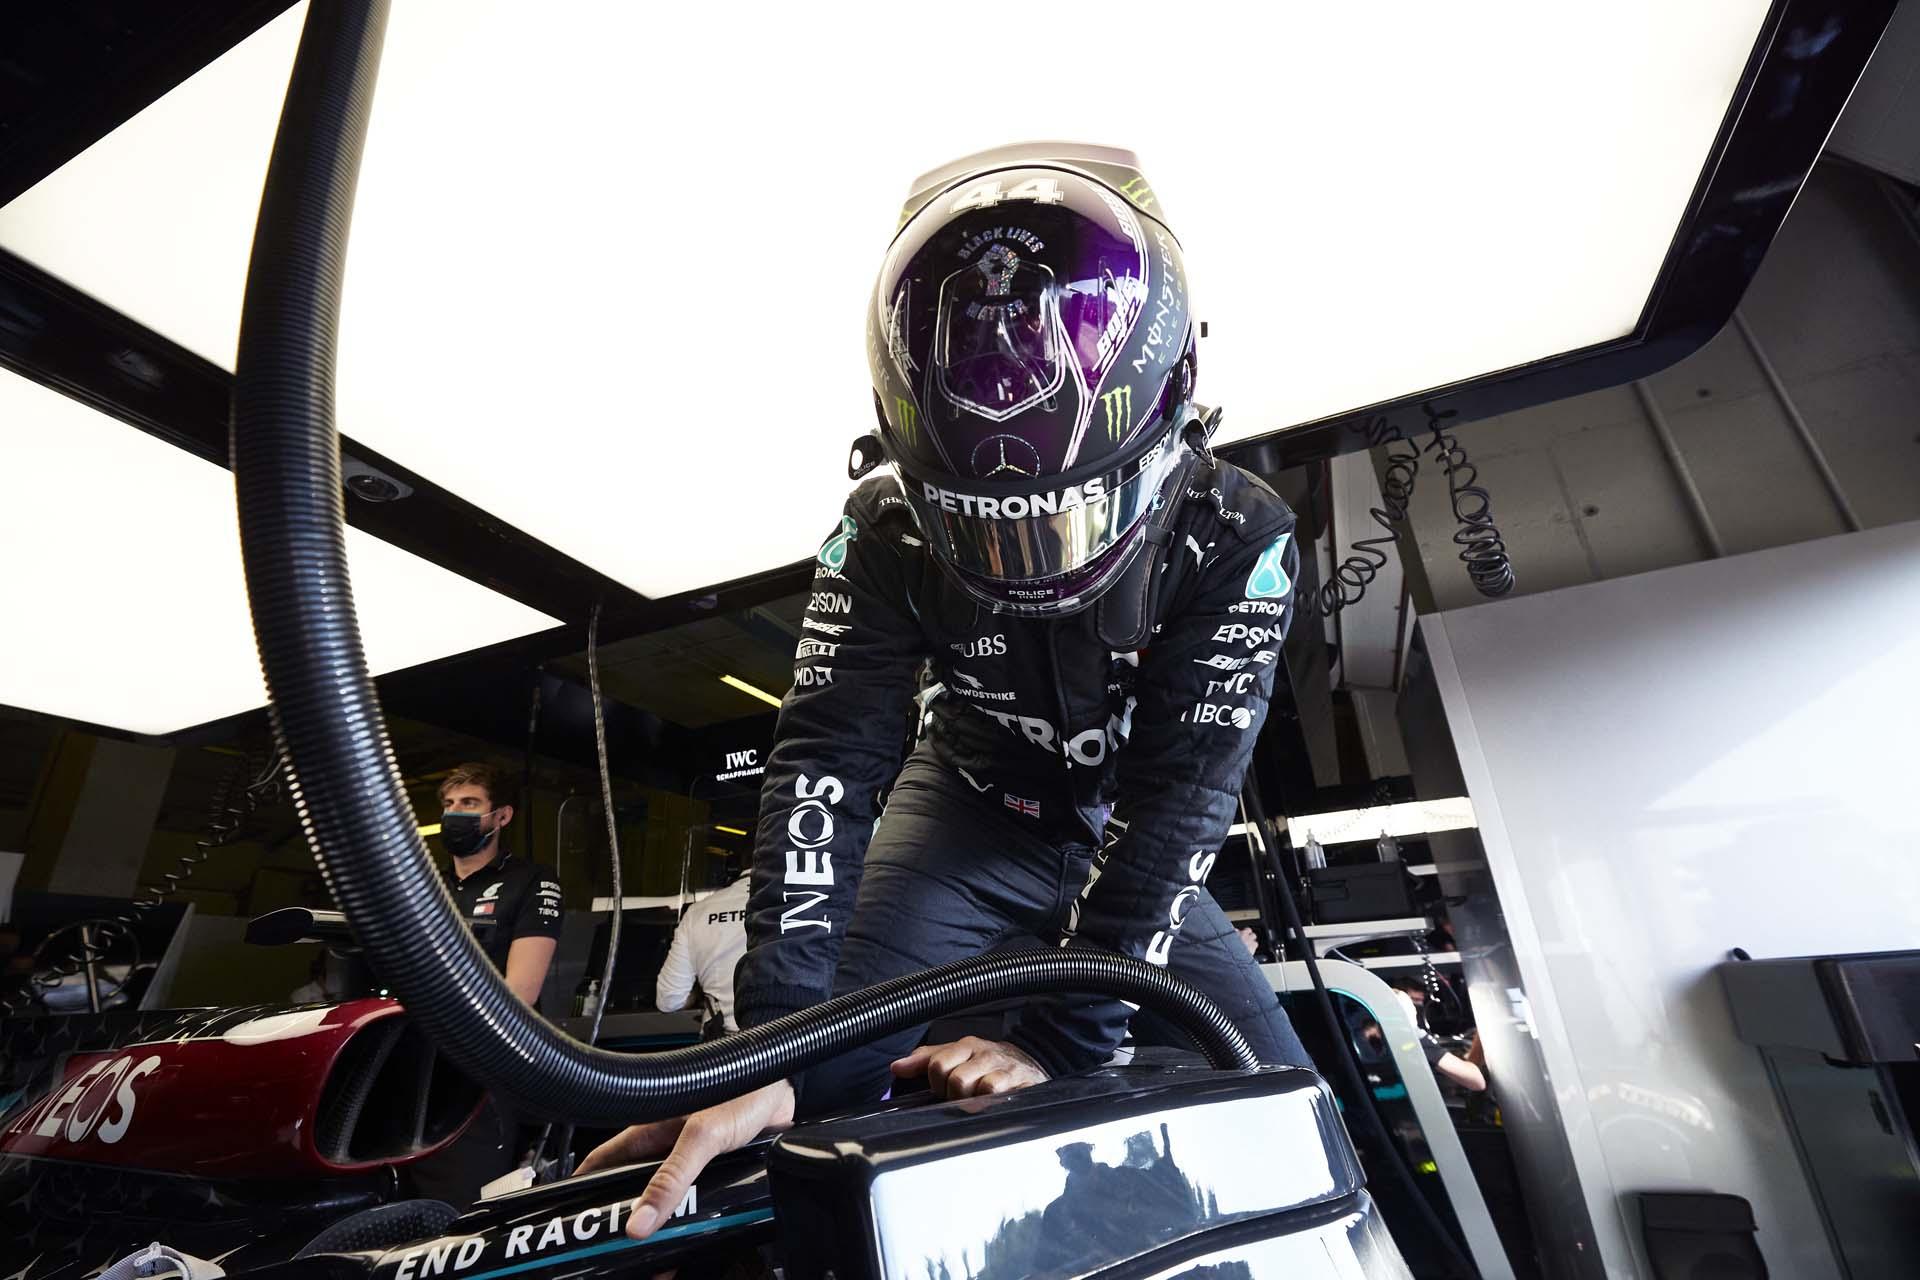 2020 Emilia Romagna Grand Prix, Saturday - Steve Etherington